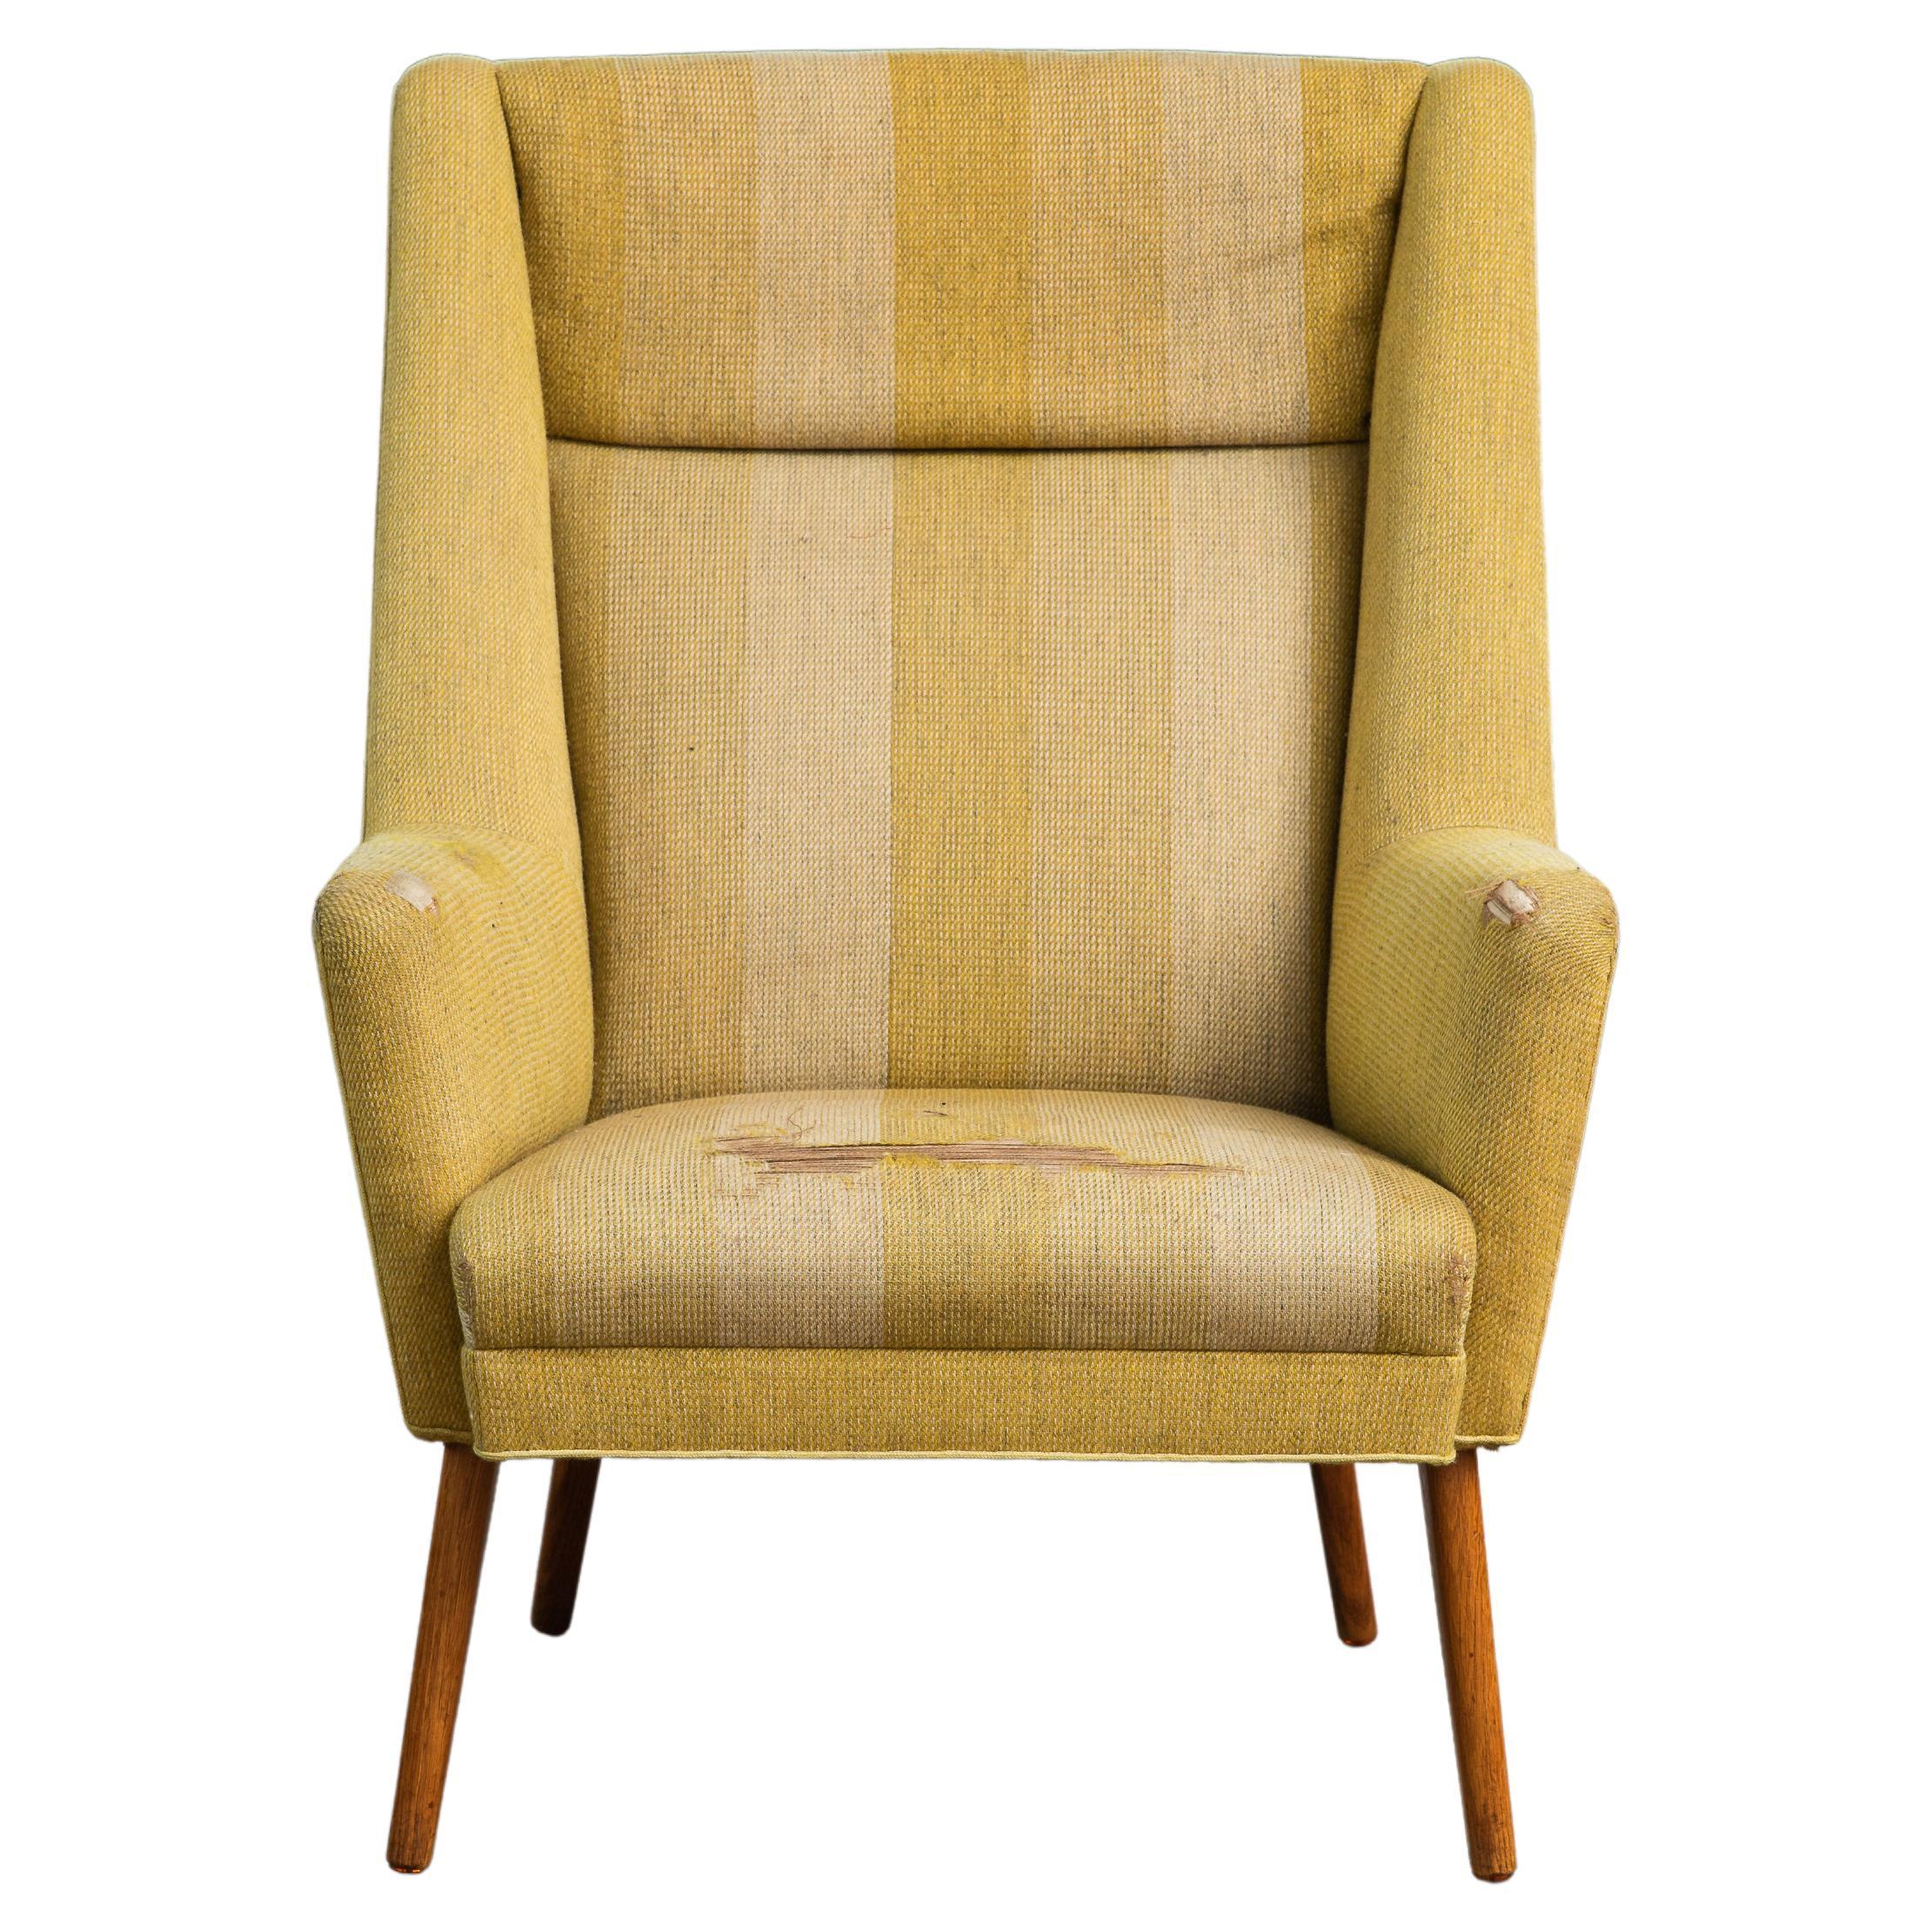 Danish Modern Late 1950's Lounge Chair